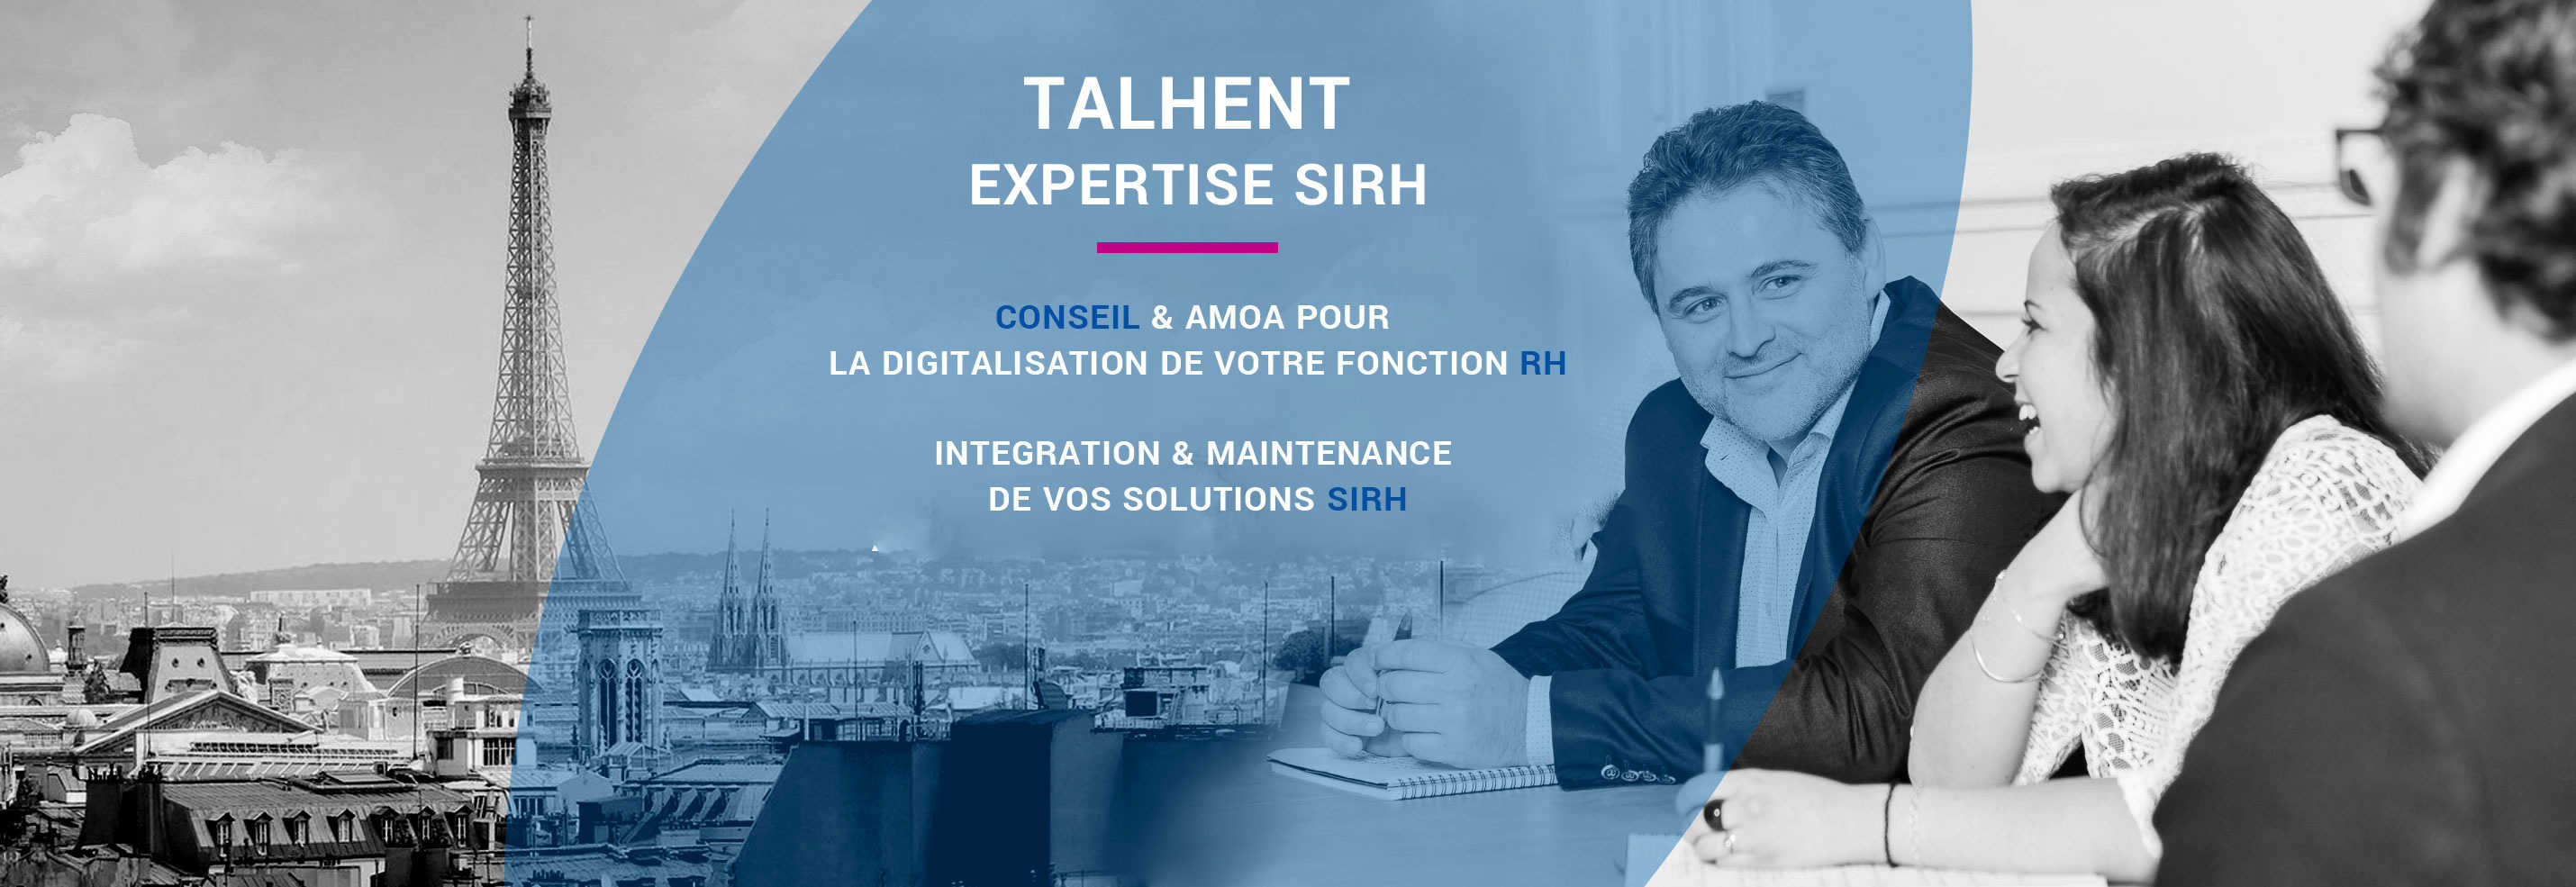 TalHenT Expertise SIRH